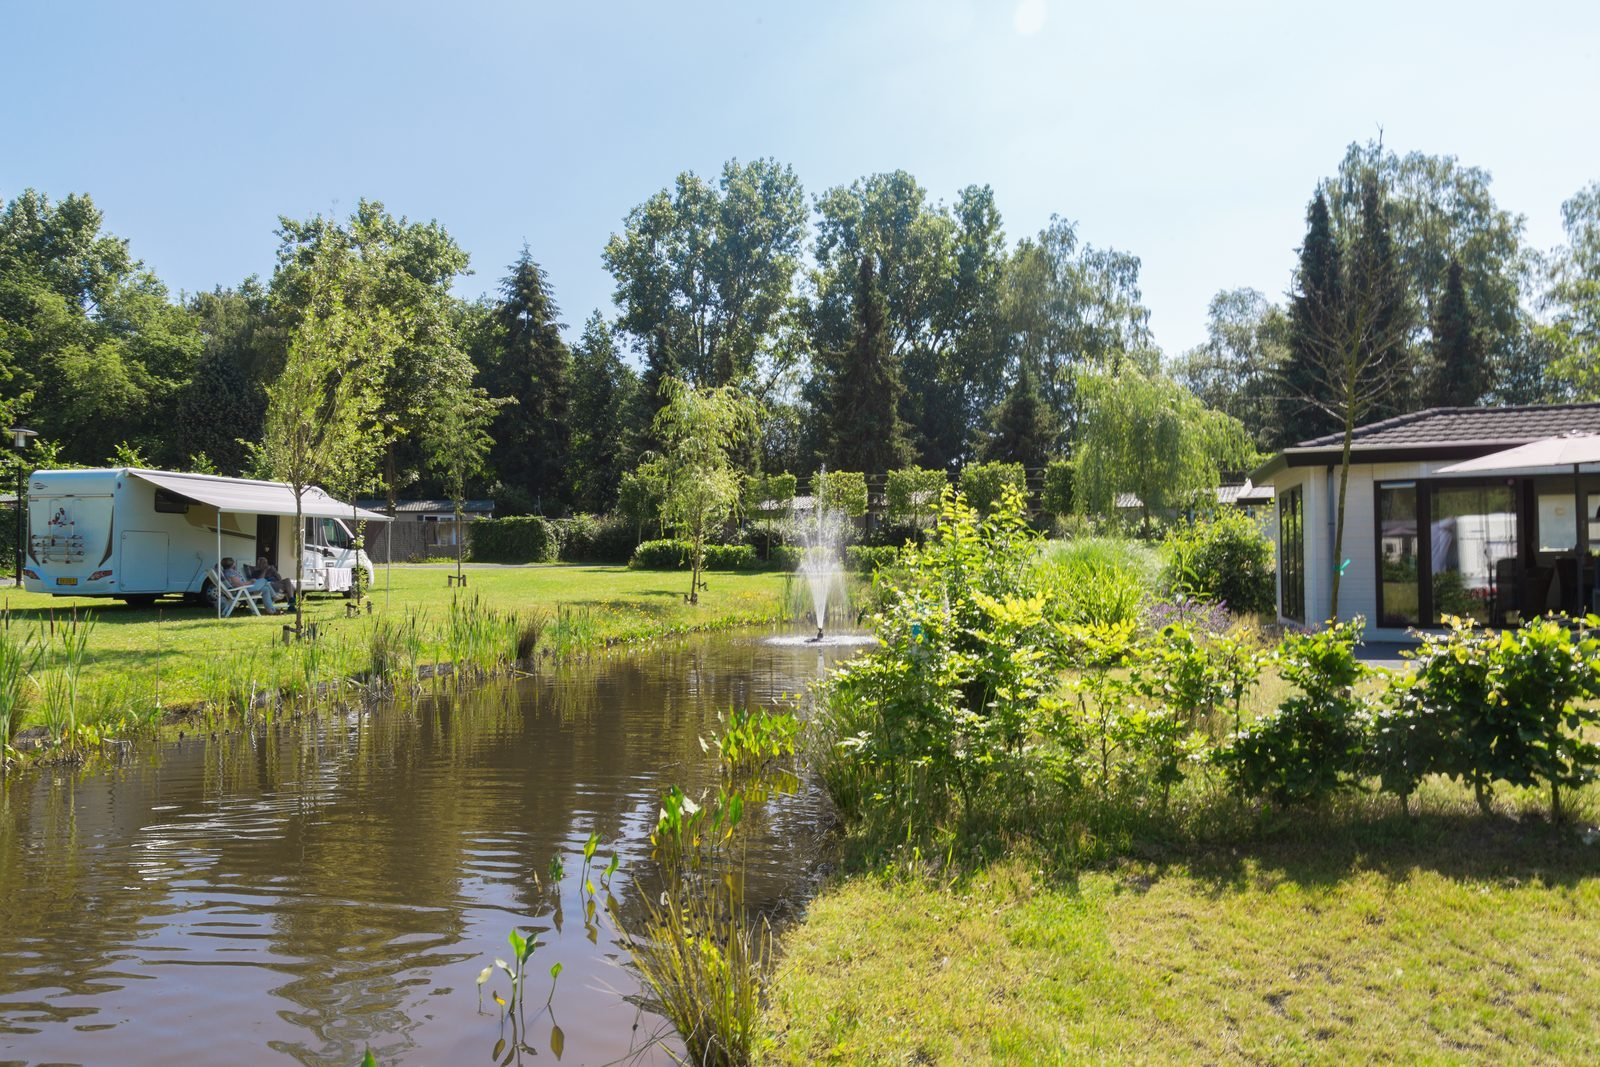 Ferienhäuser & Camping-Stellplätze | Ferienanlage De Wielerbaan